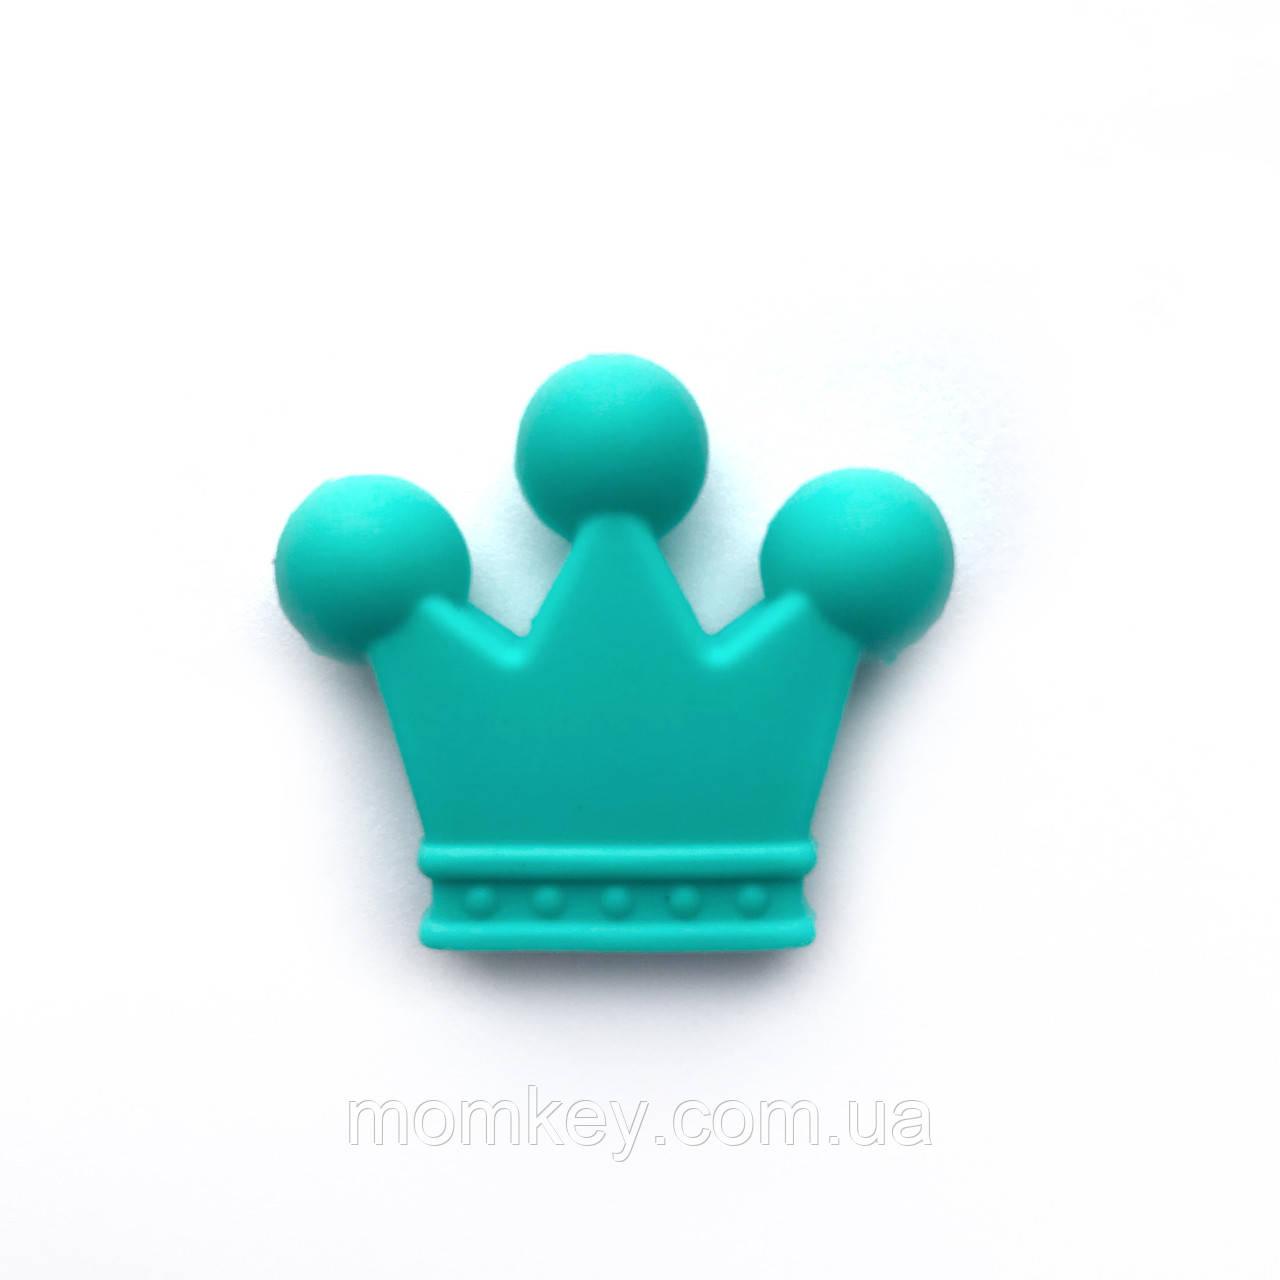 Корона 35*30*7 мм (бирюза)